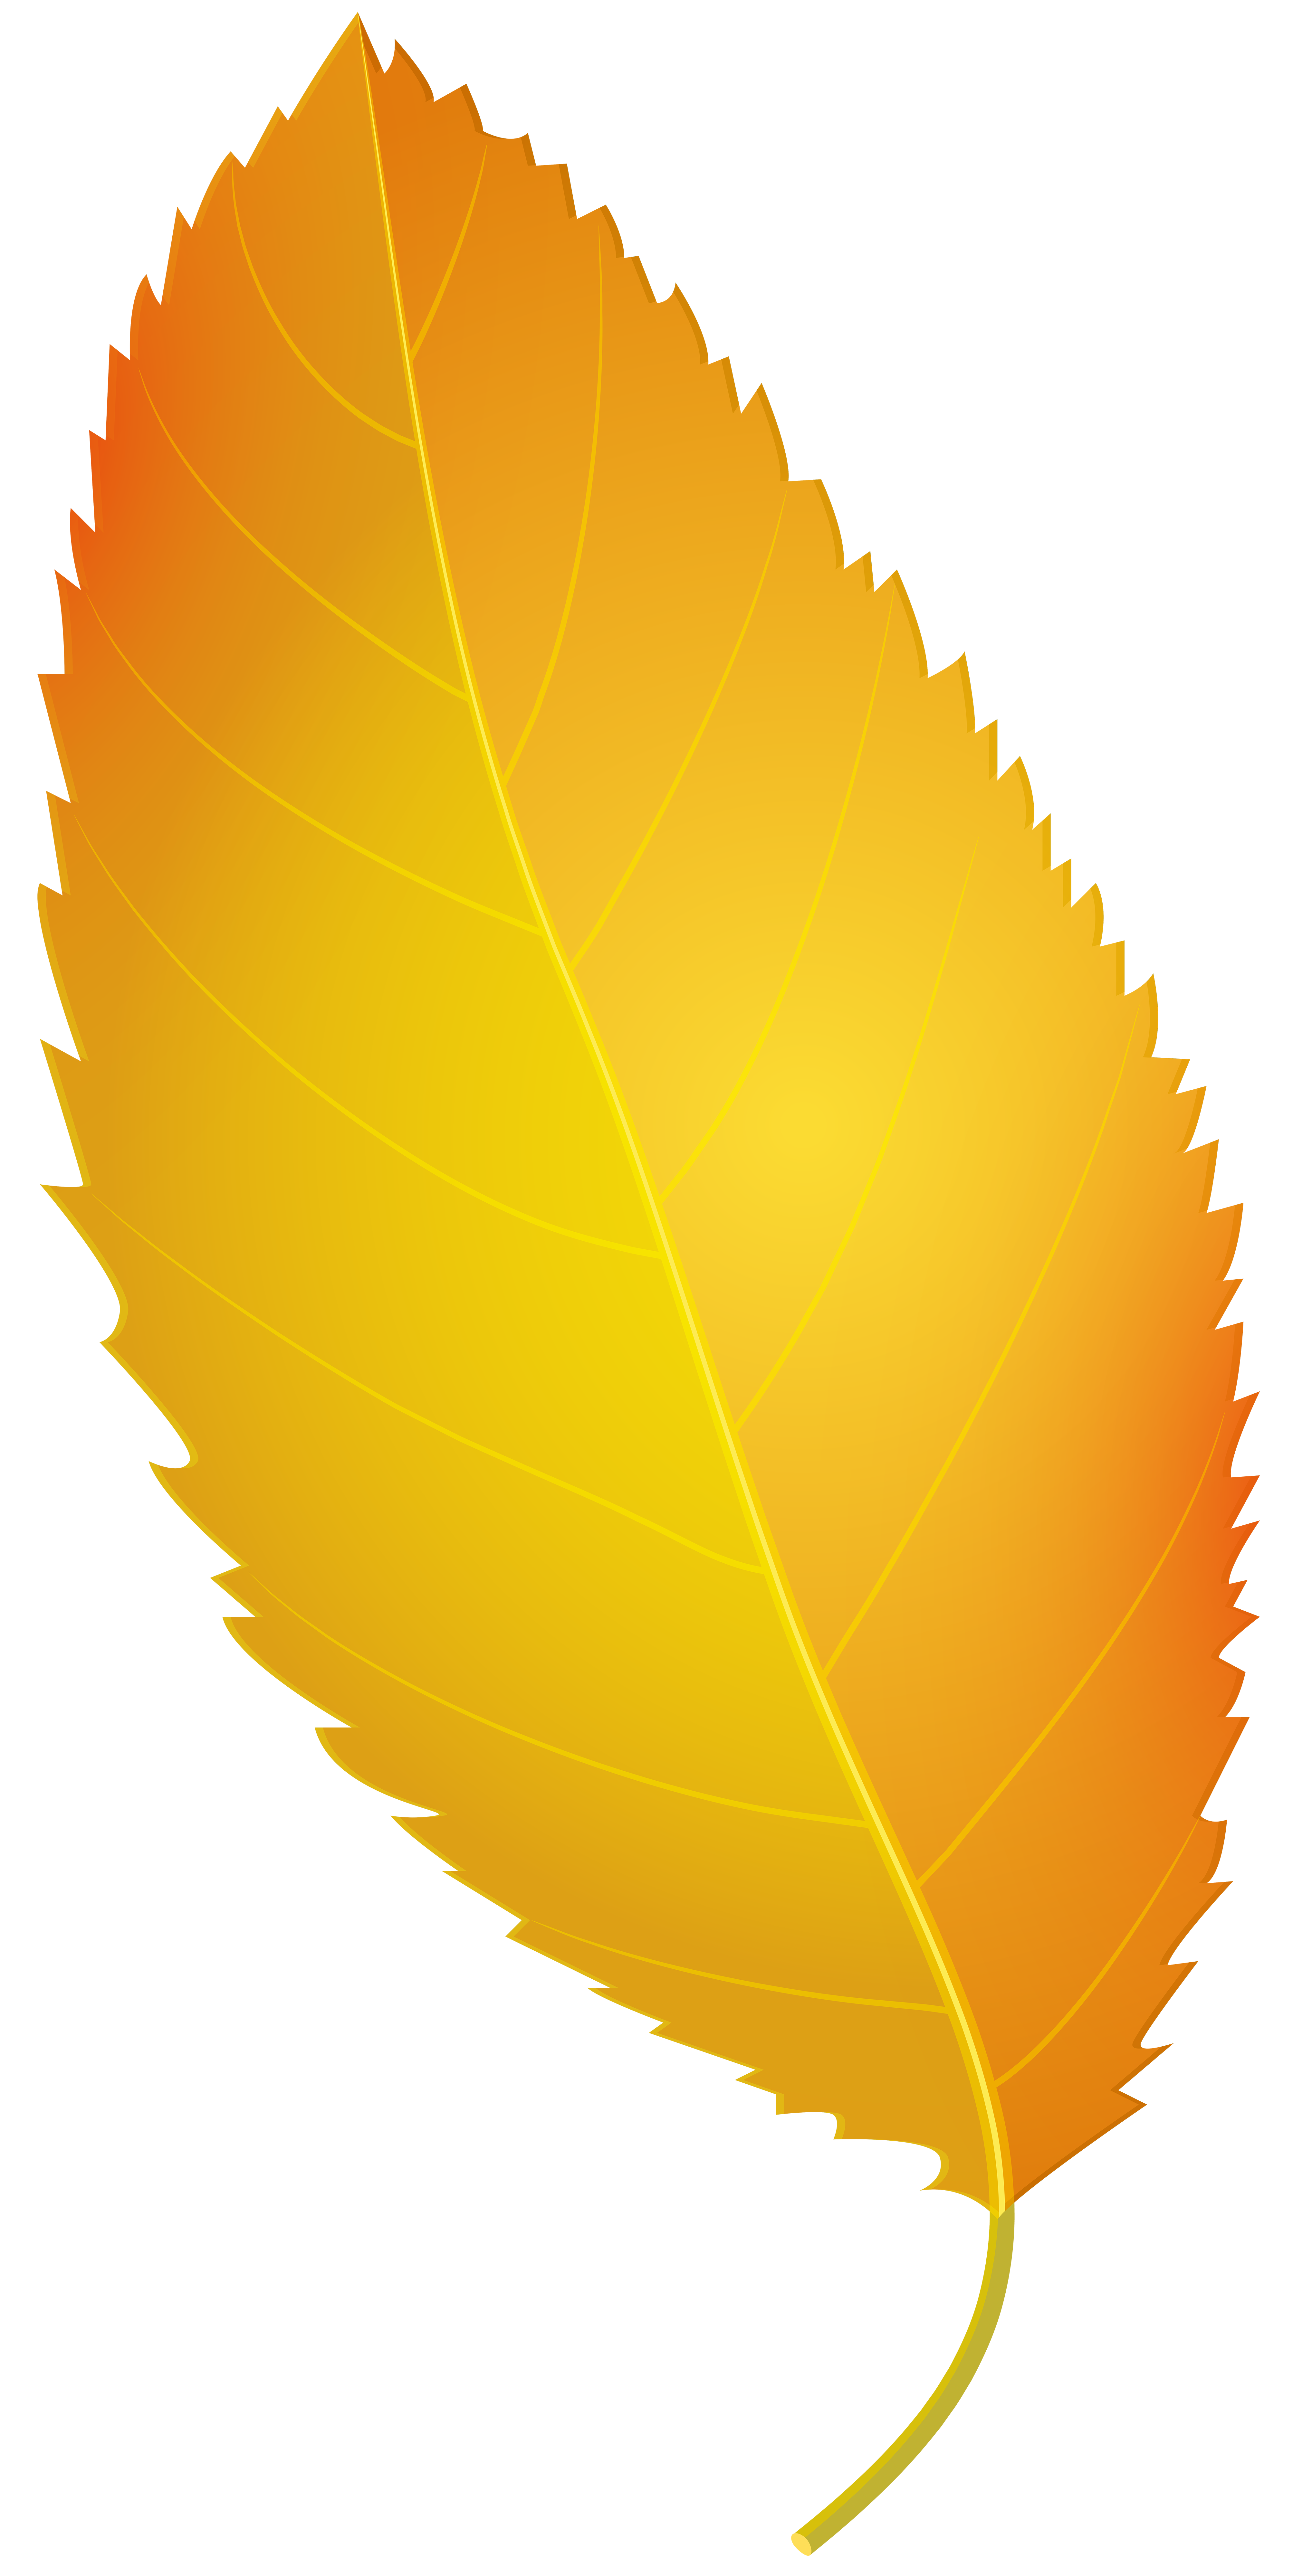 Clipart sun autumn. Yellow leaf png clip